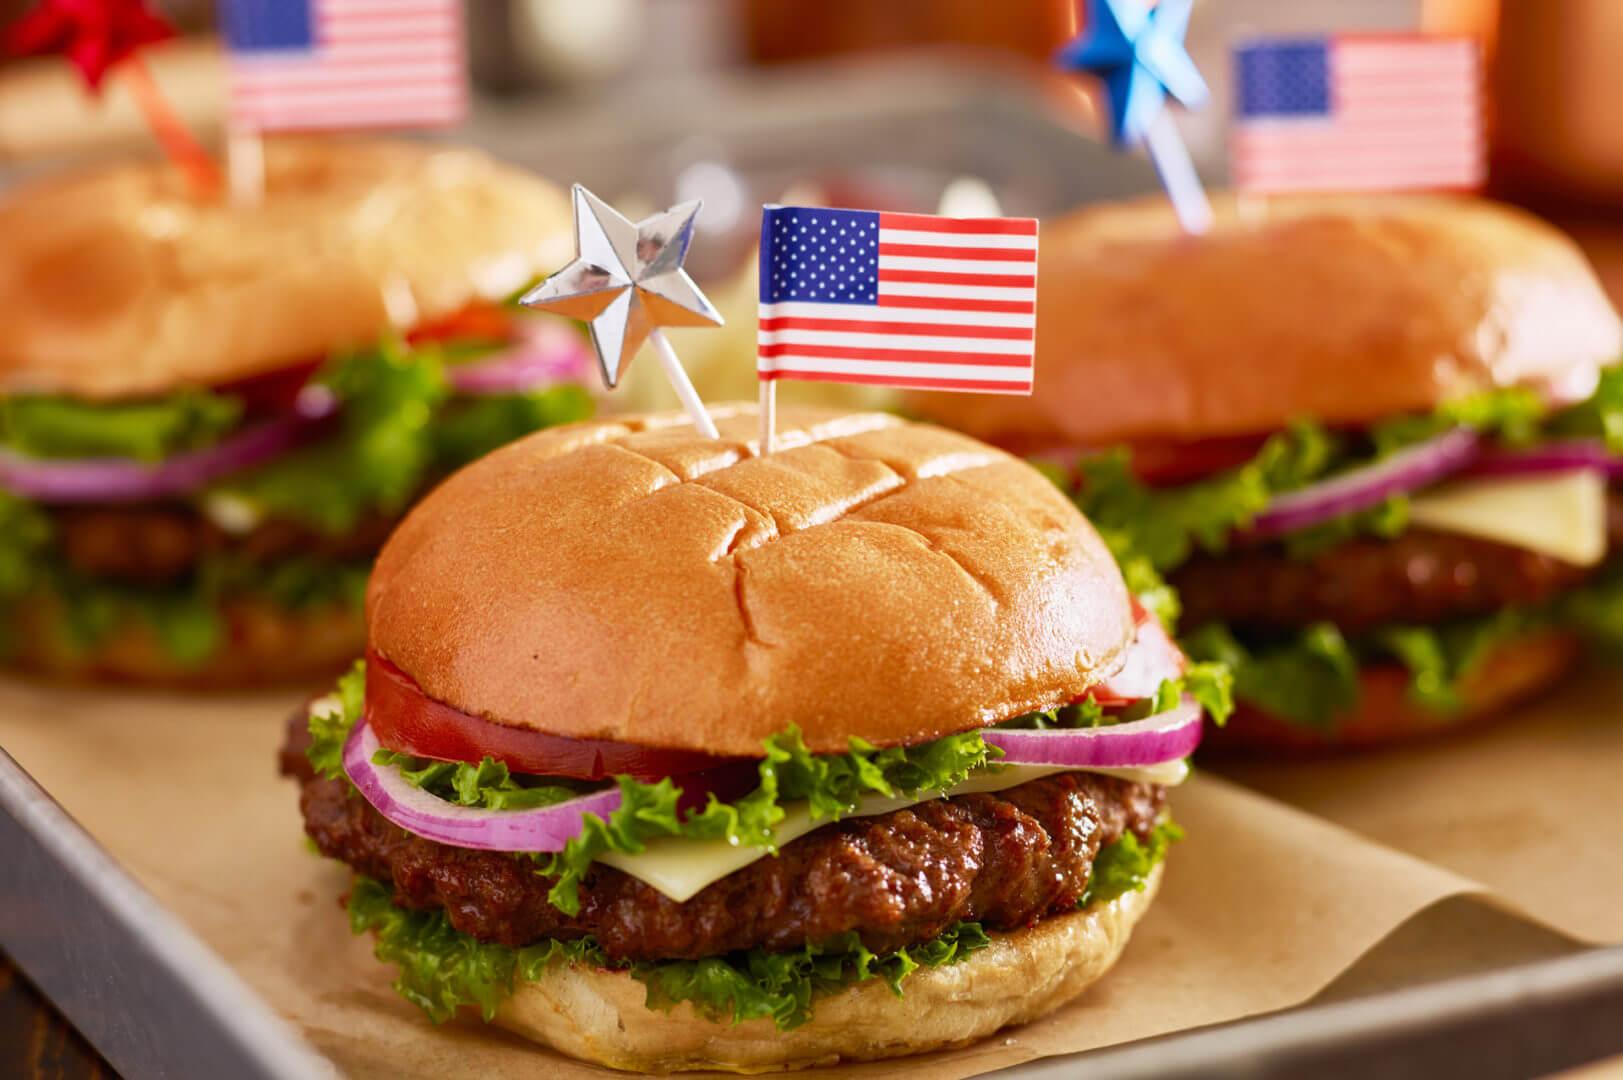 ss-burger-flag-american-election